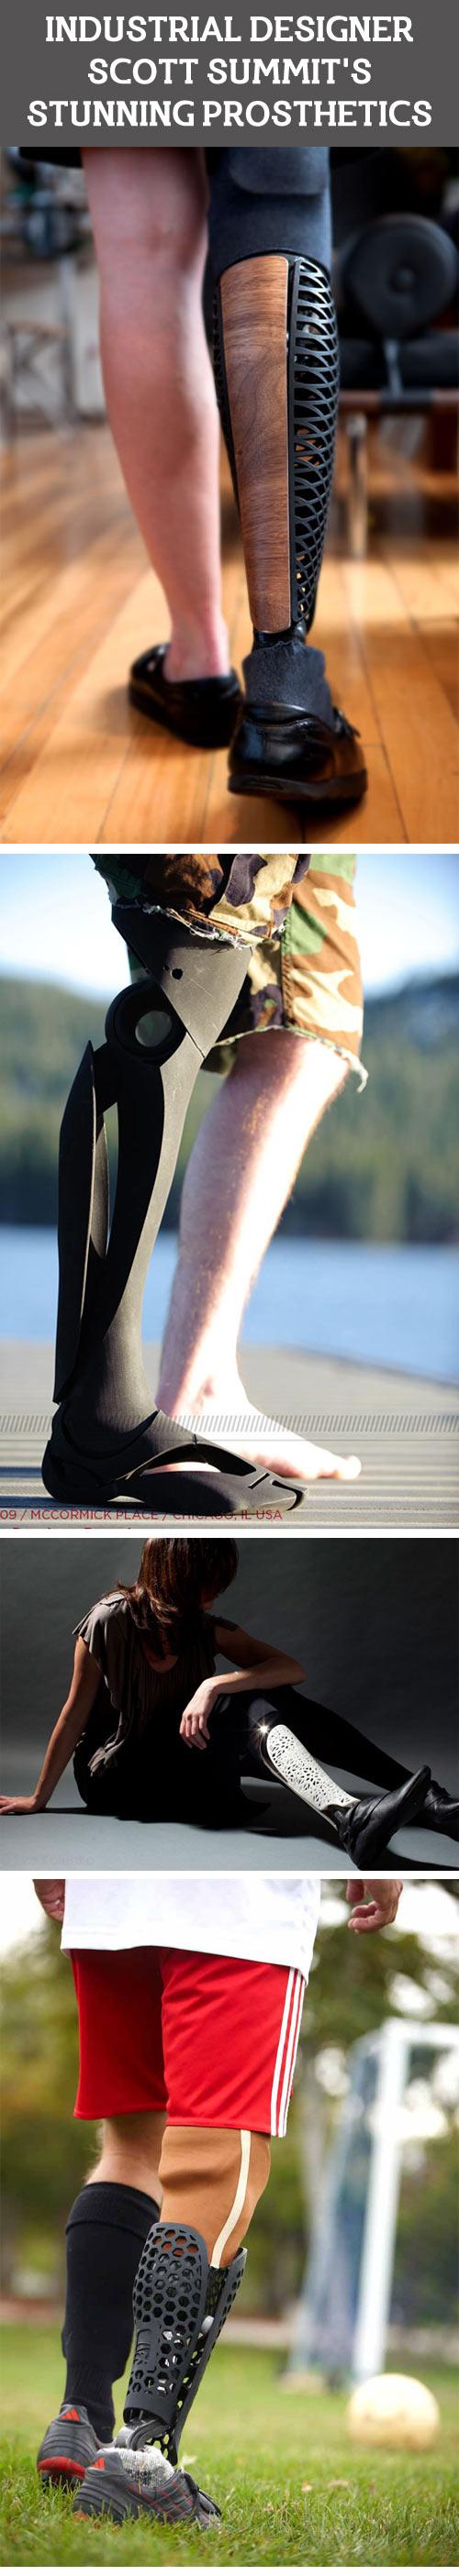 cool-industrial-designer-prosthetics